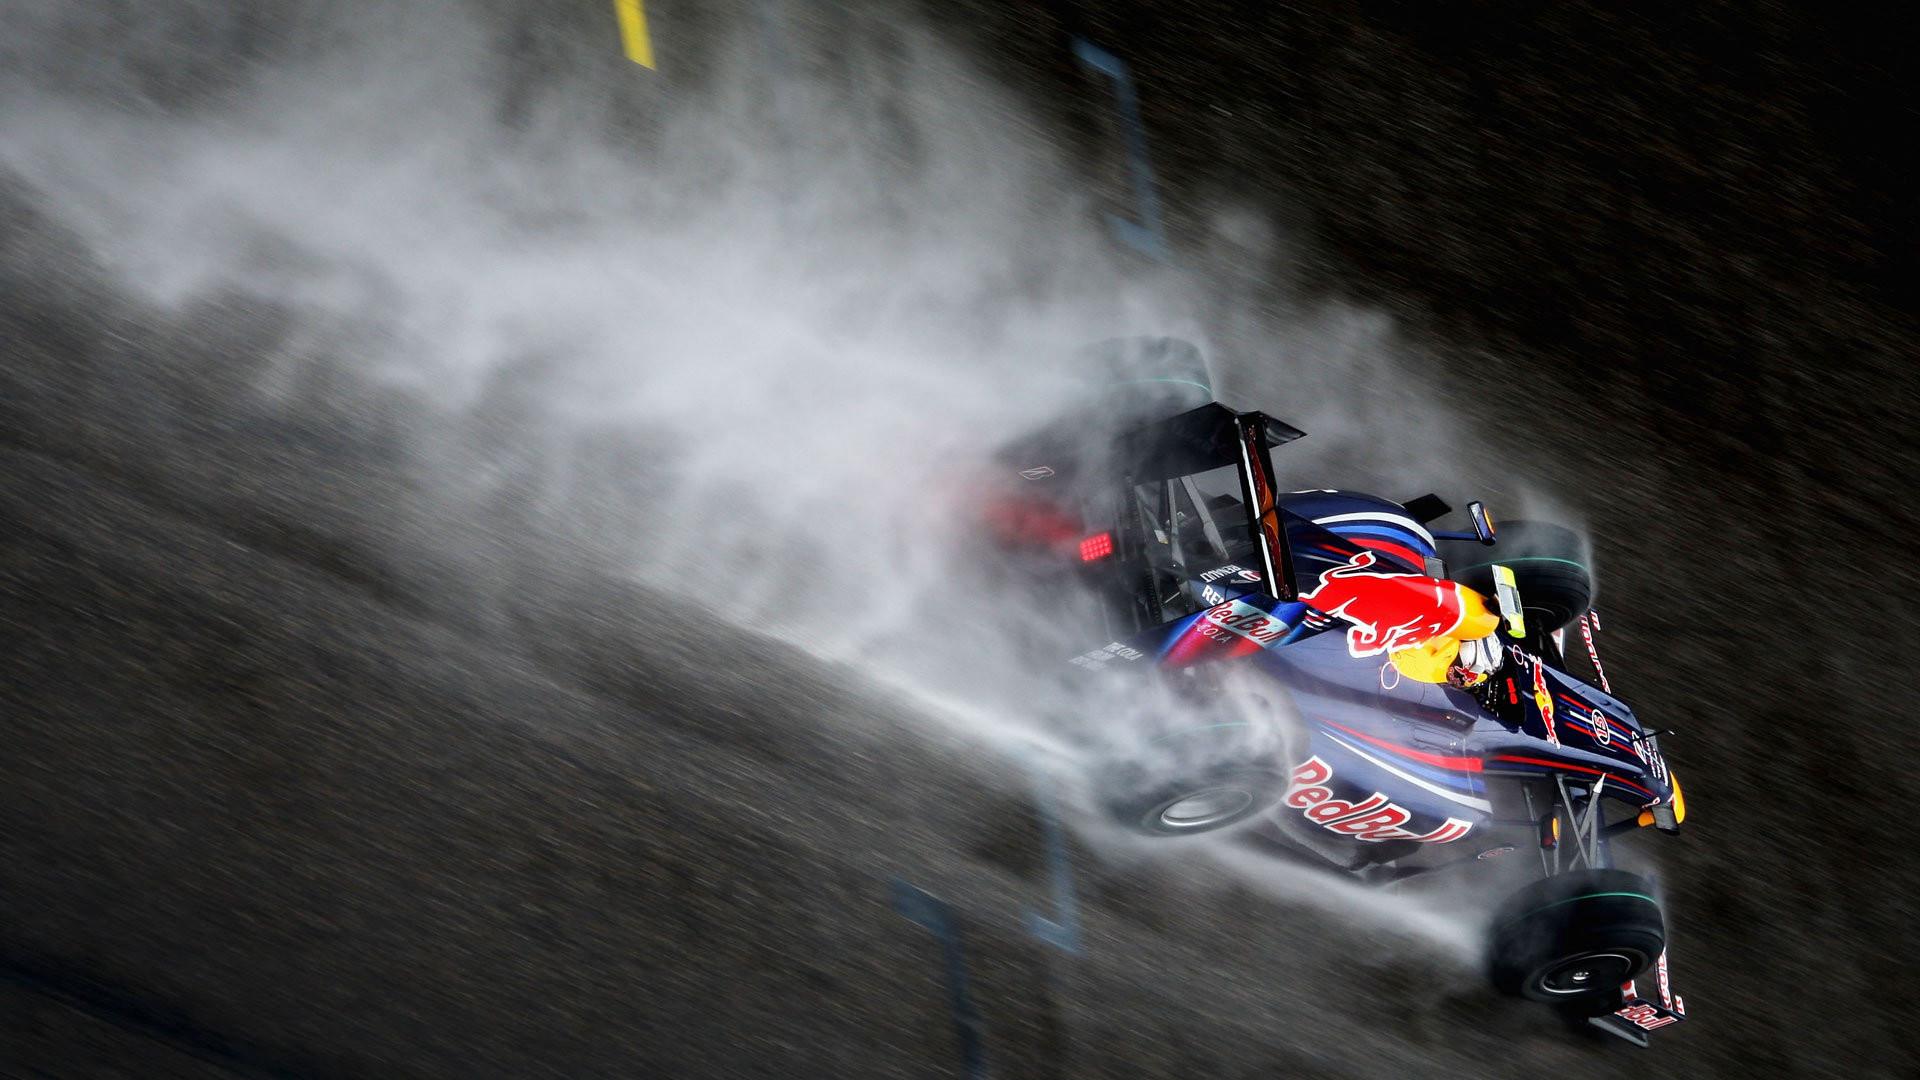 Hand-Picked Beautiful Formula 1 Wallpapers | CrispMe